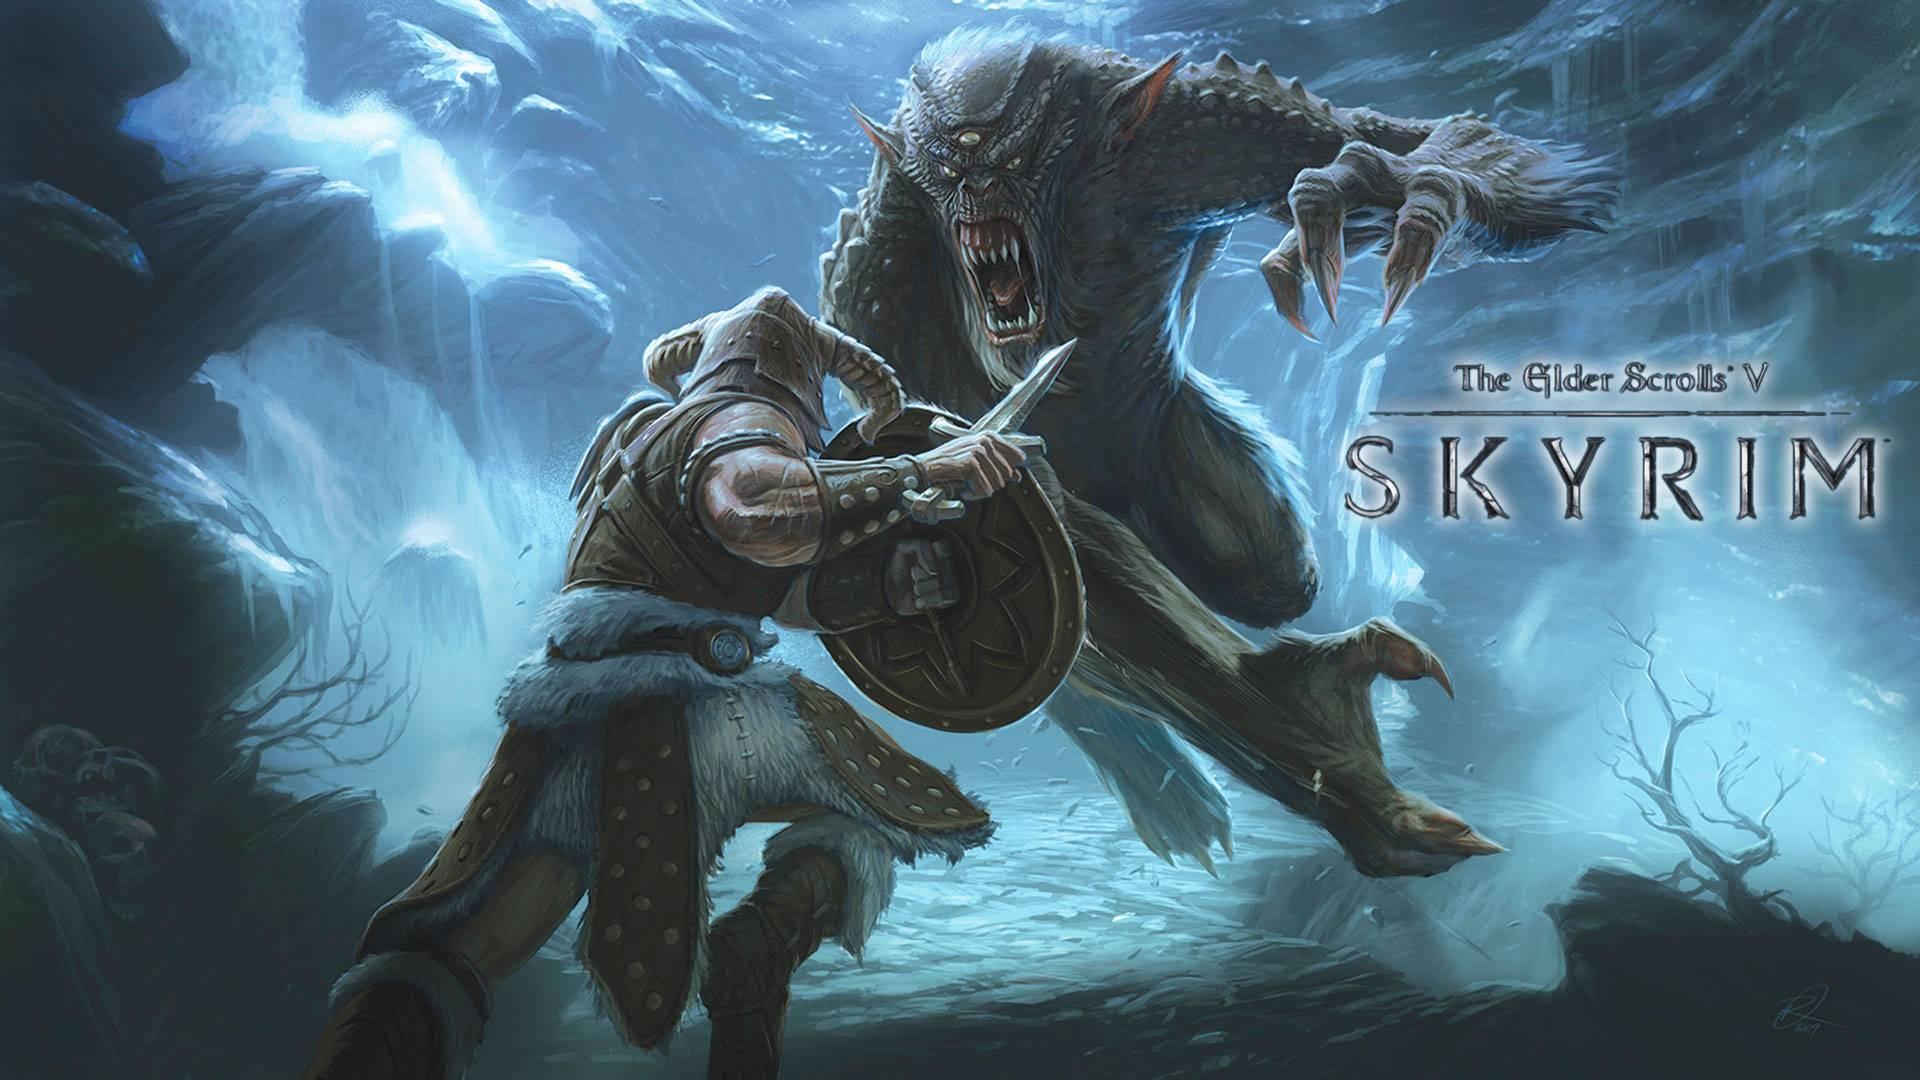 Elder Scrolls V Skyrim Wallpapers In Full 1080p Hd Page 4